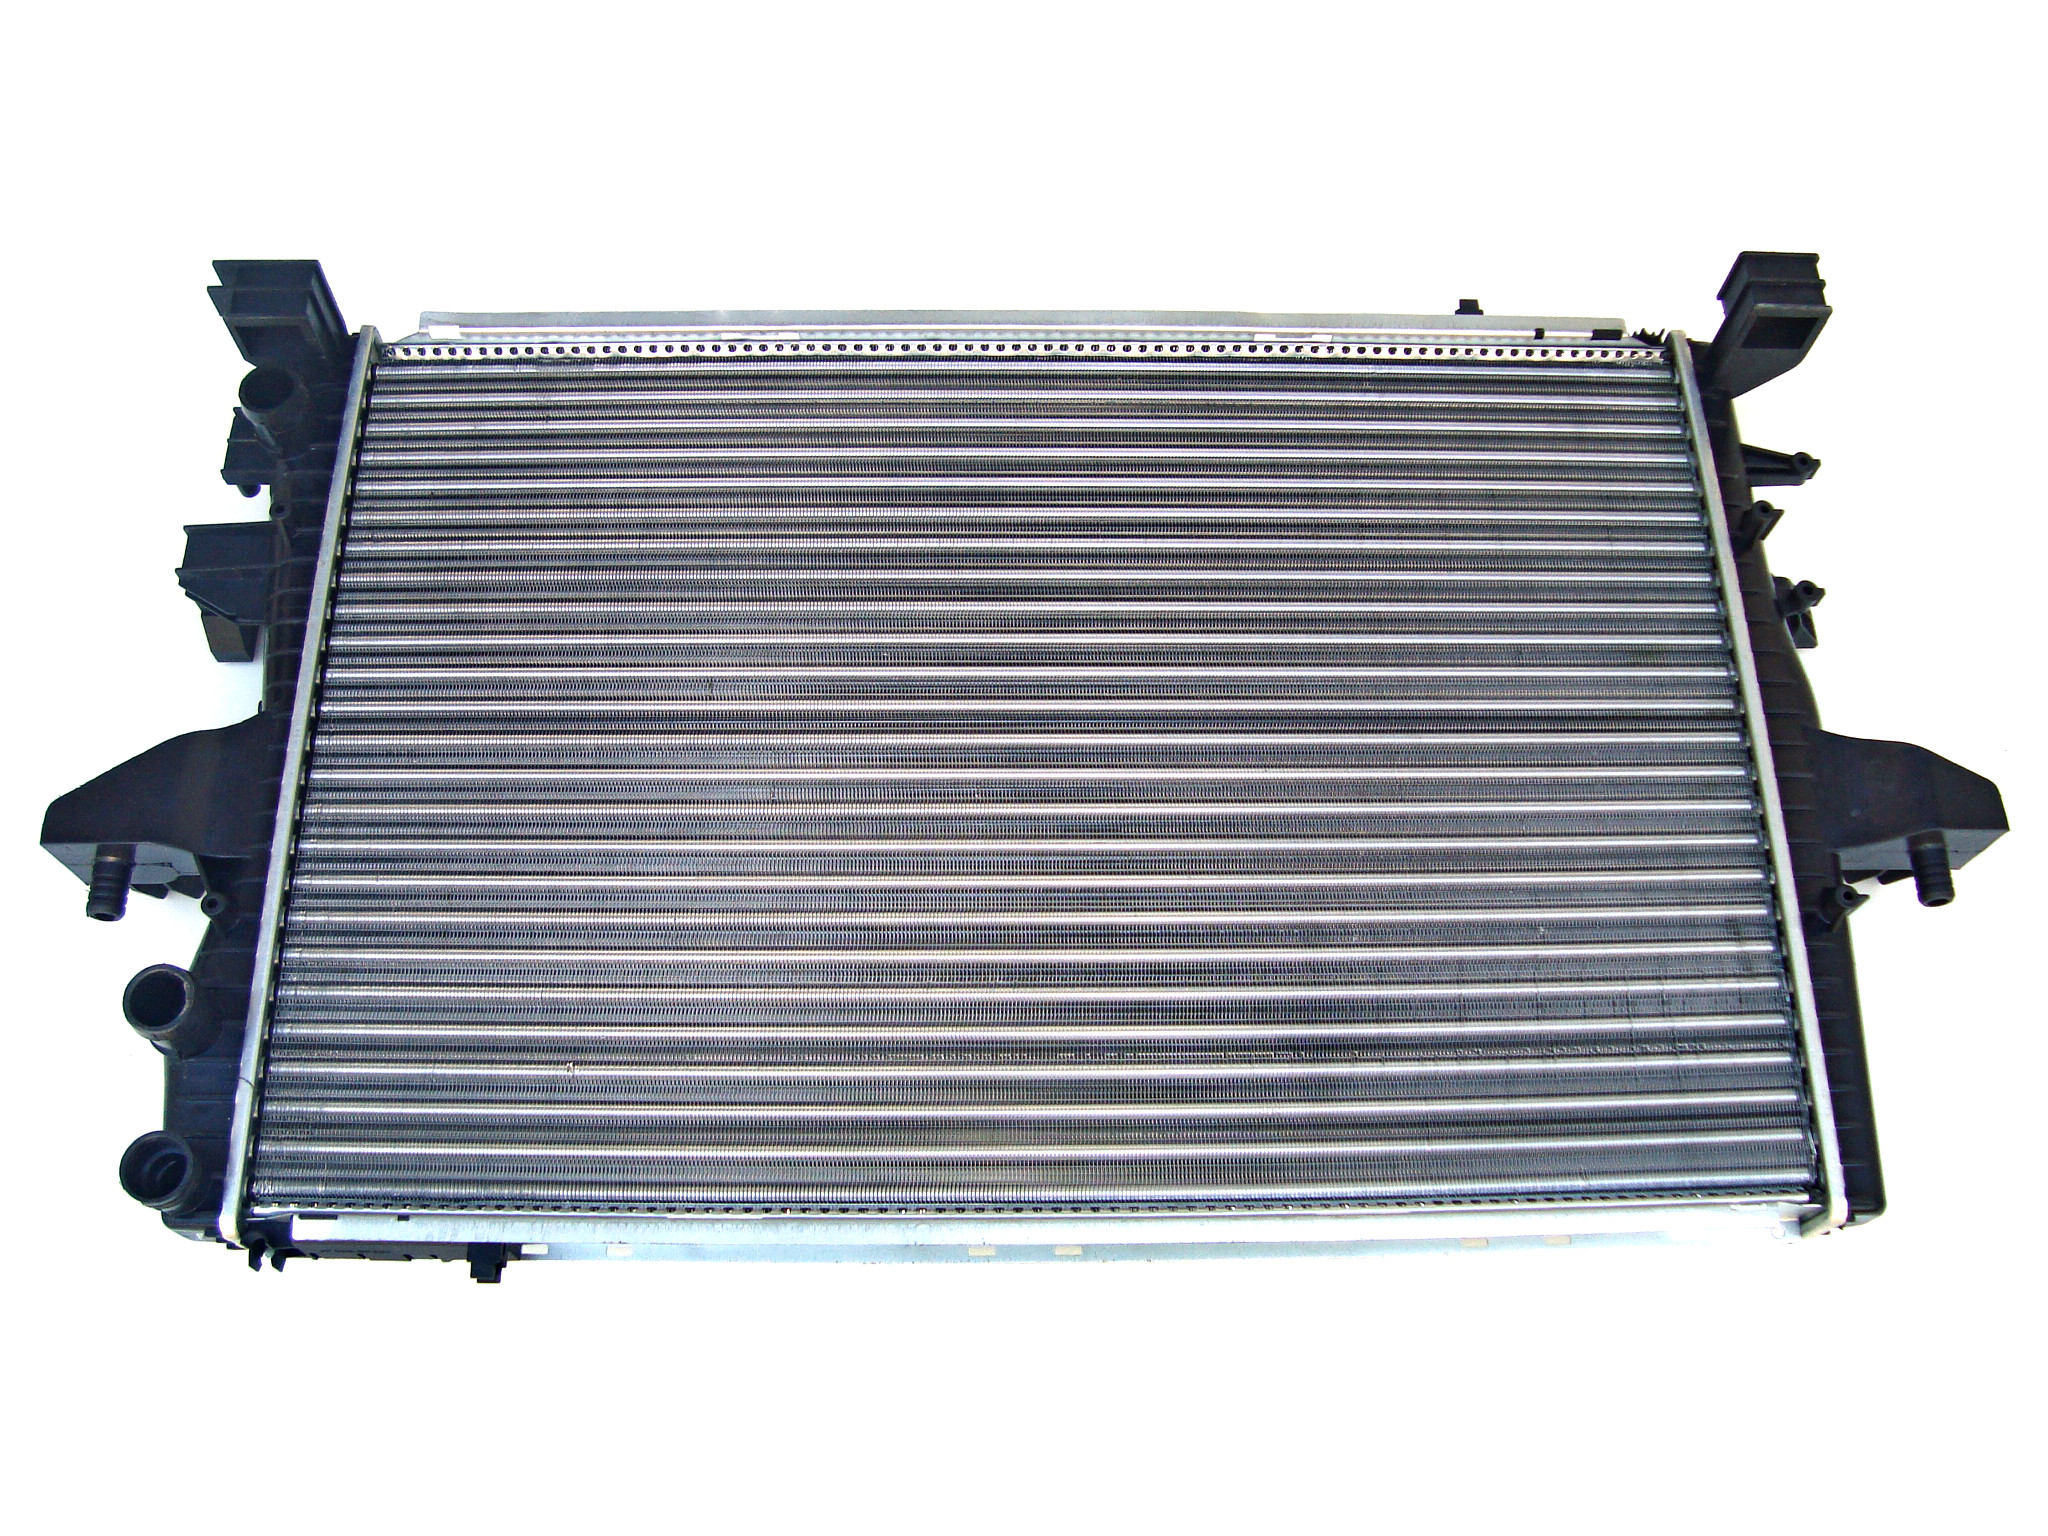 радиатор воды multivan vw транспортер t5 19 tdi